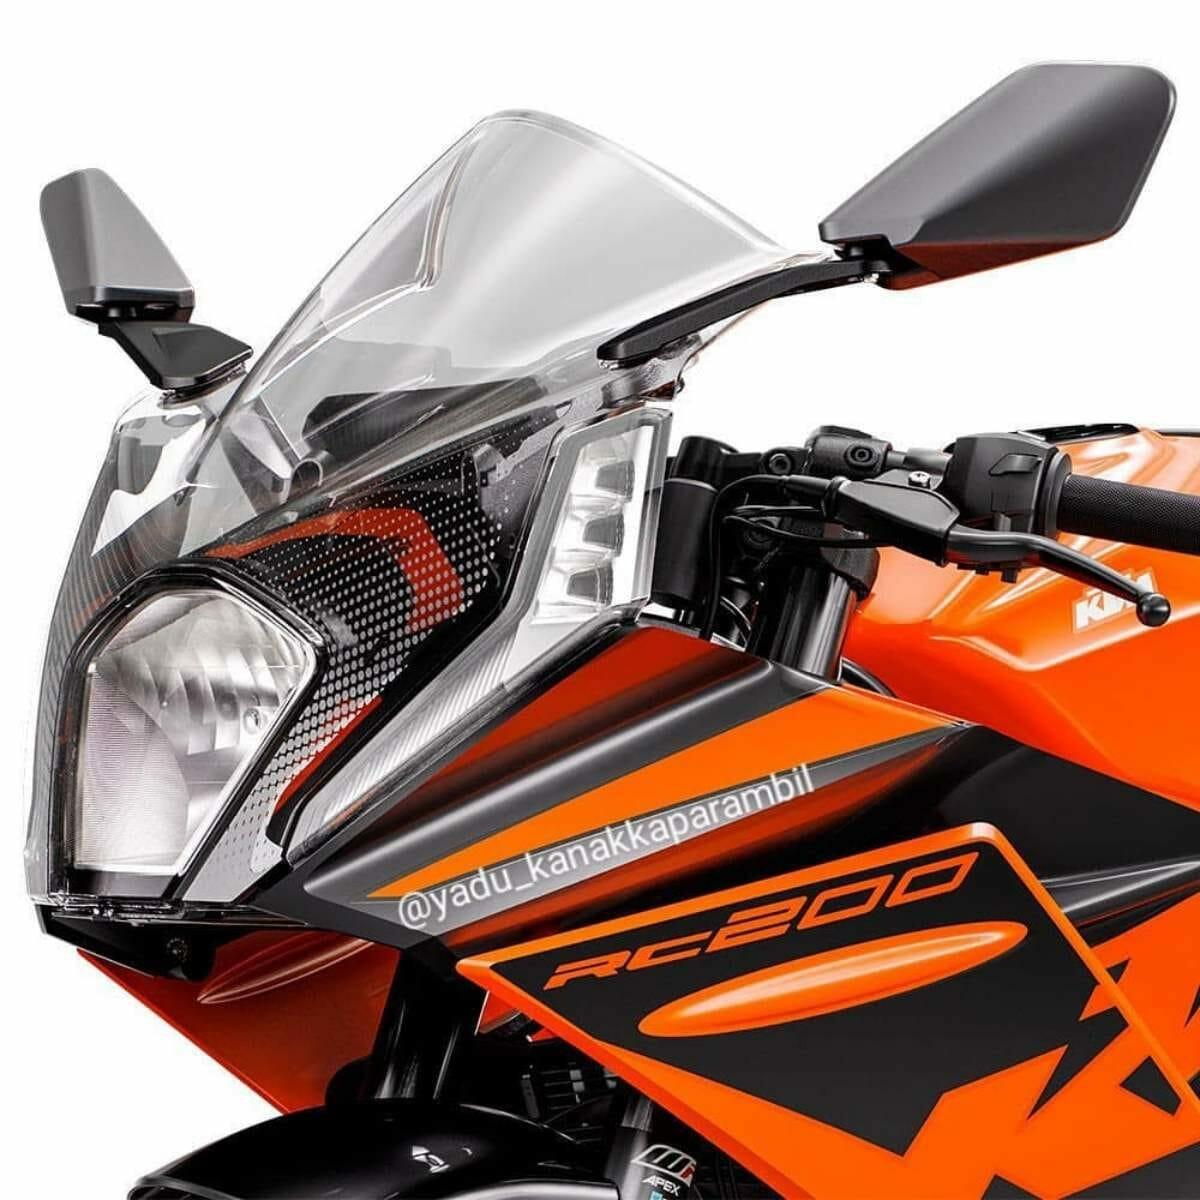 2022 KTM RC 200 Leaked (1)